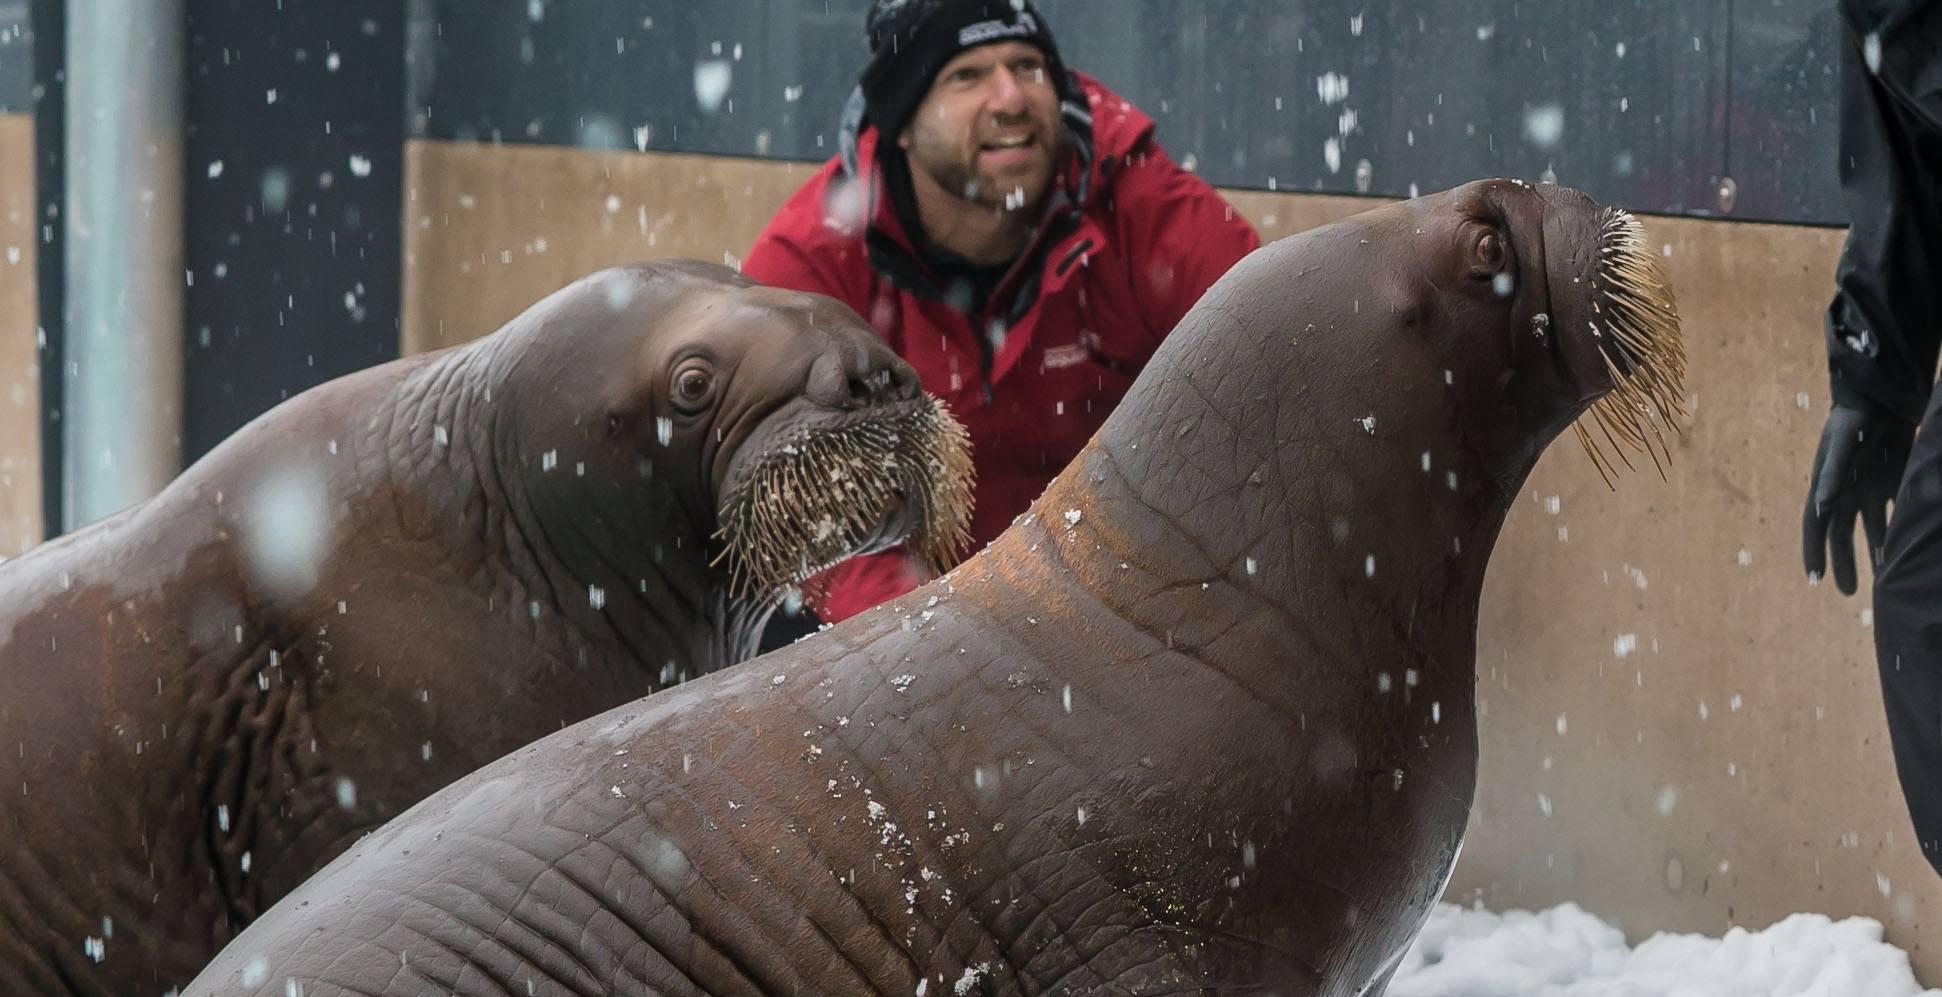 Balzak and lakina in snow vancouver aquarium